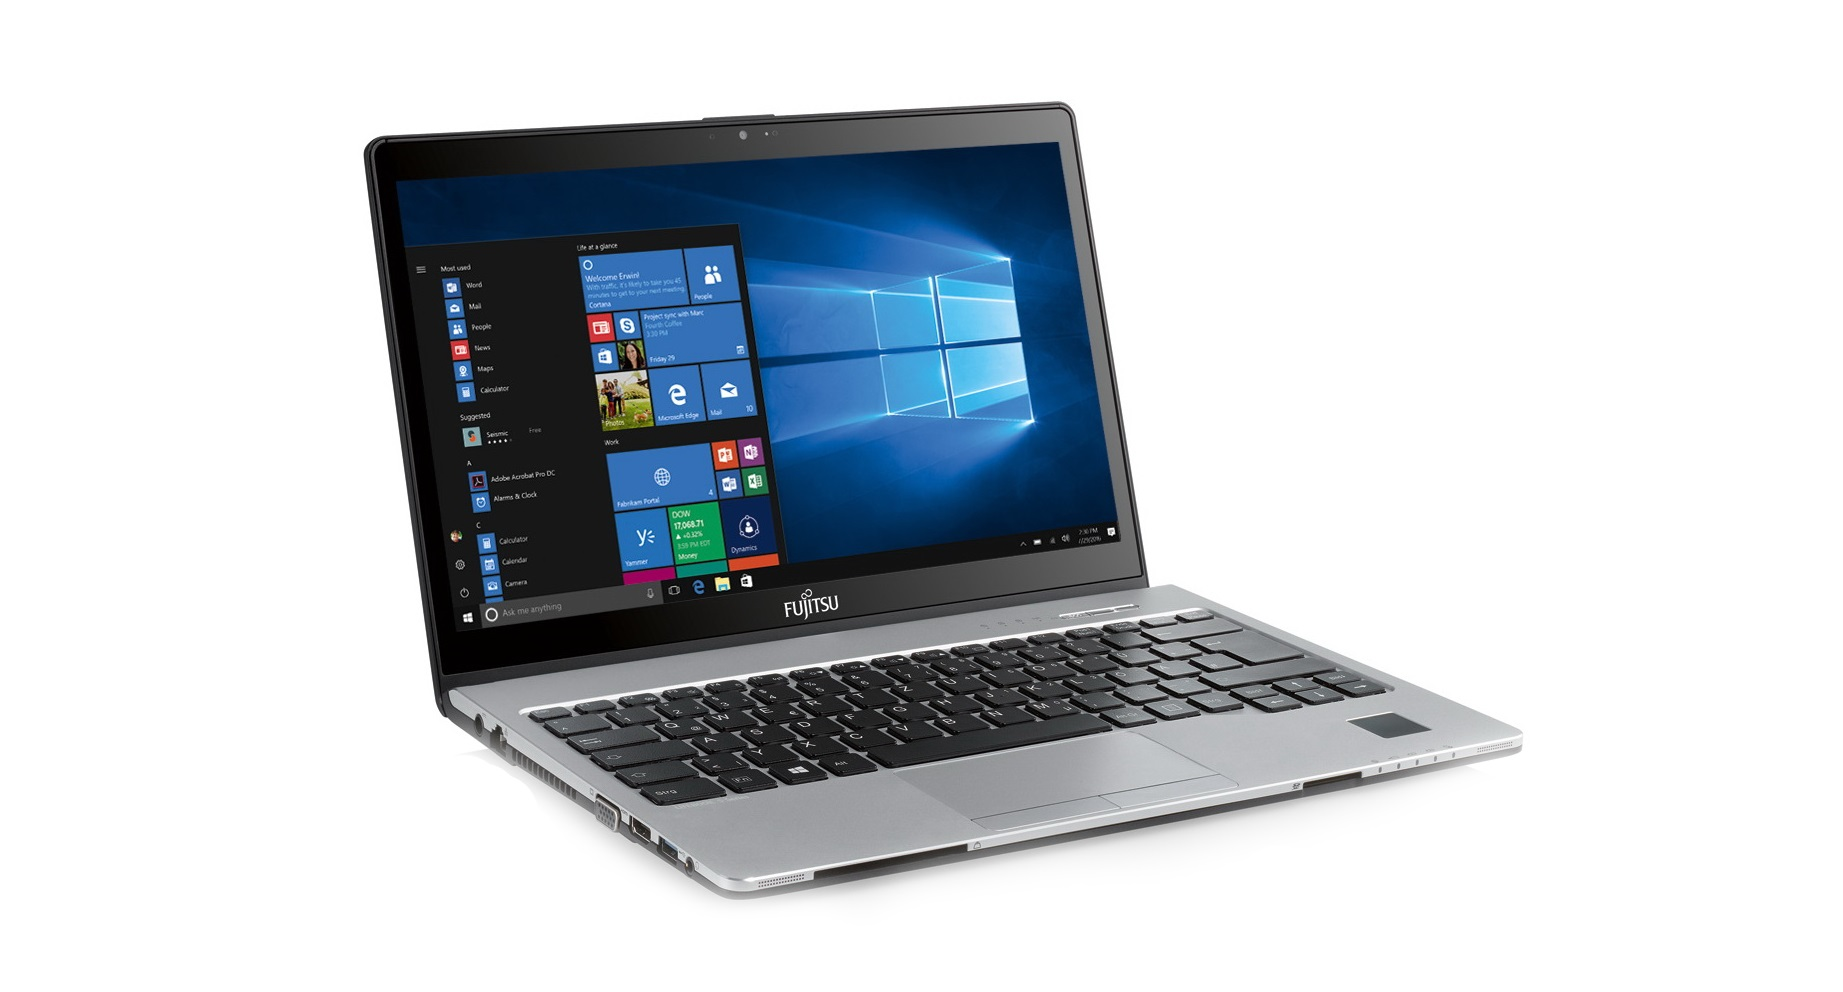 Fujitsu Lifebook S937 13 inch Laptop